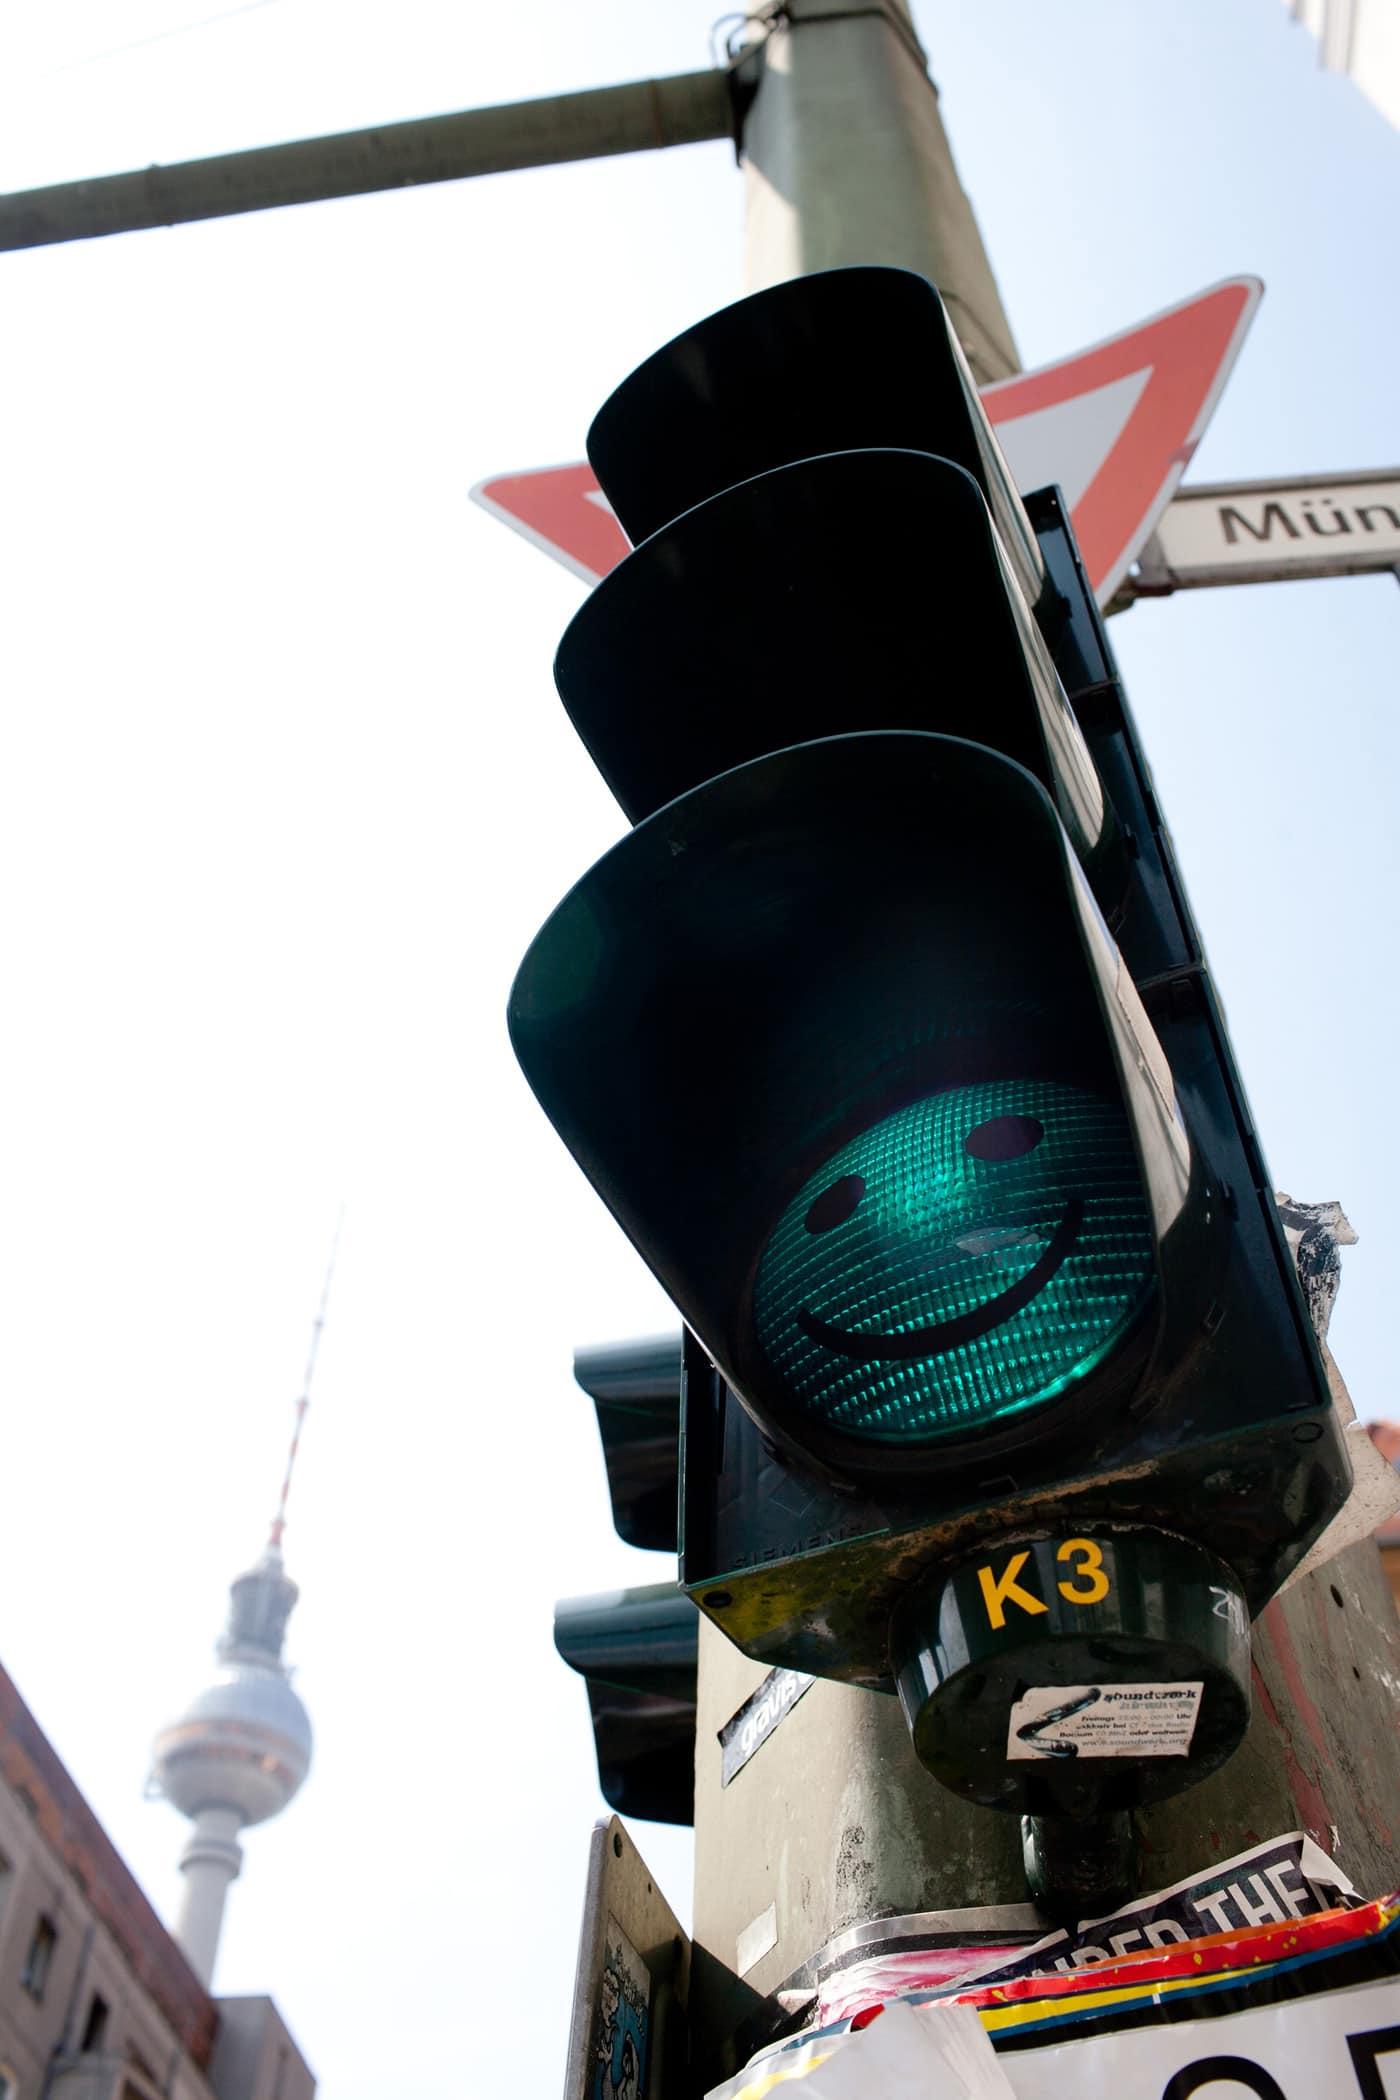 Smiley face traffic light in Berlin